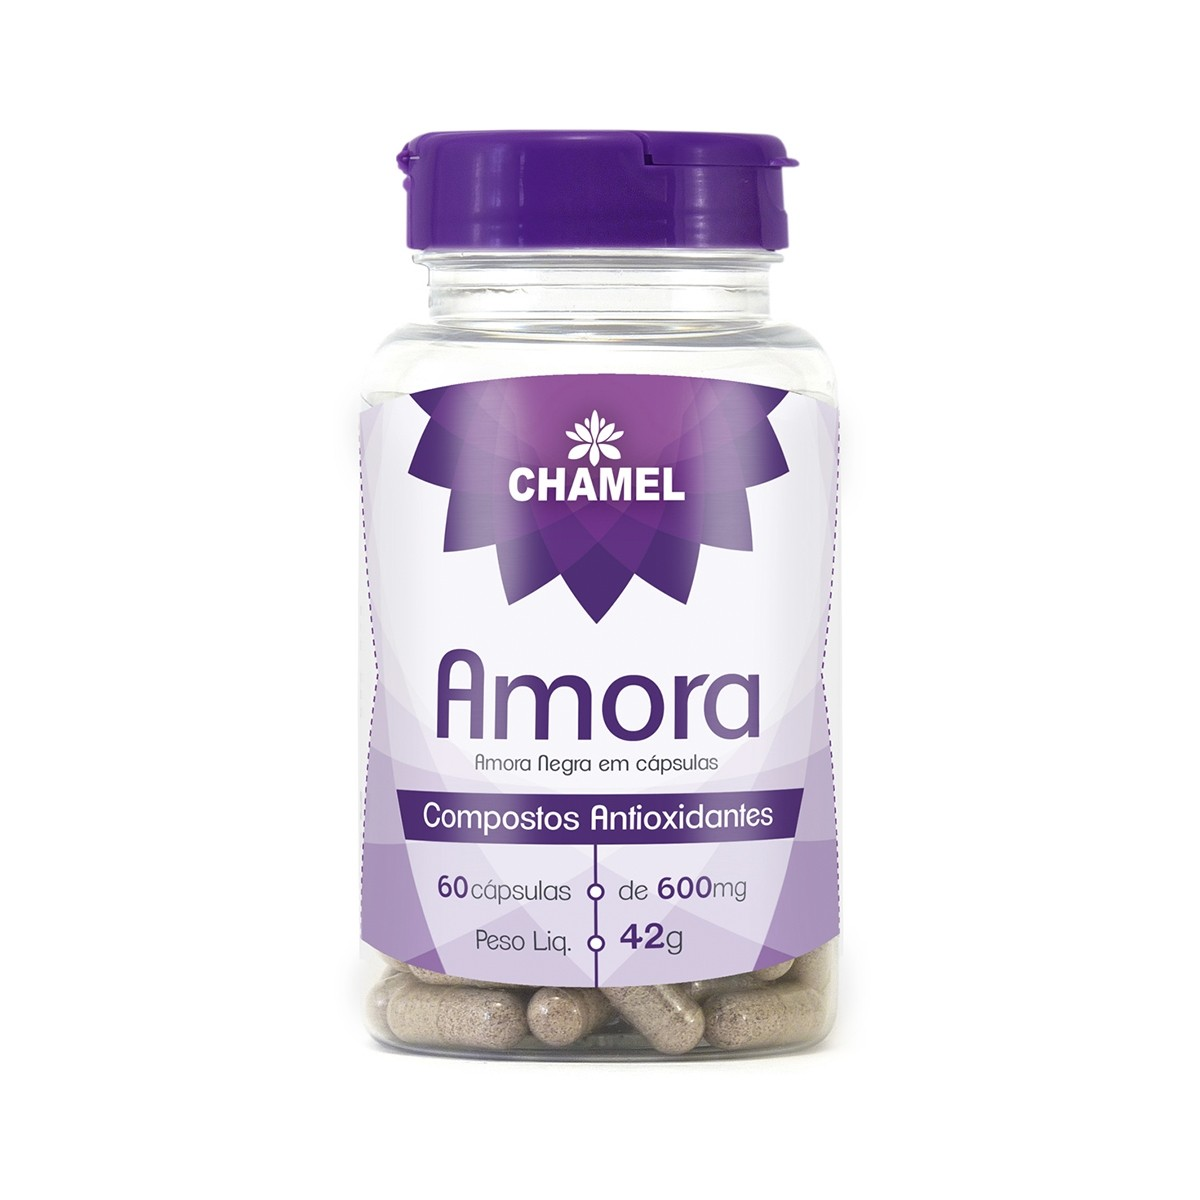 Amora 600mg 60 Cápsulas - Chamel